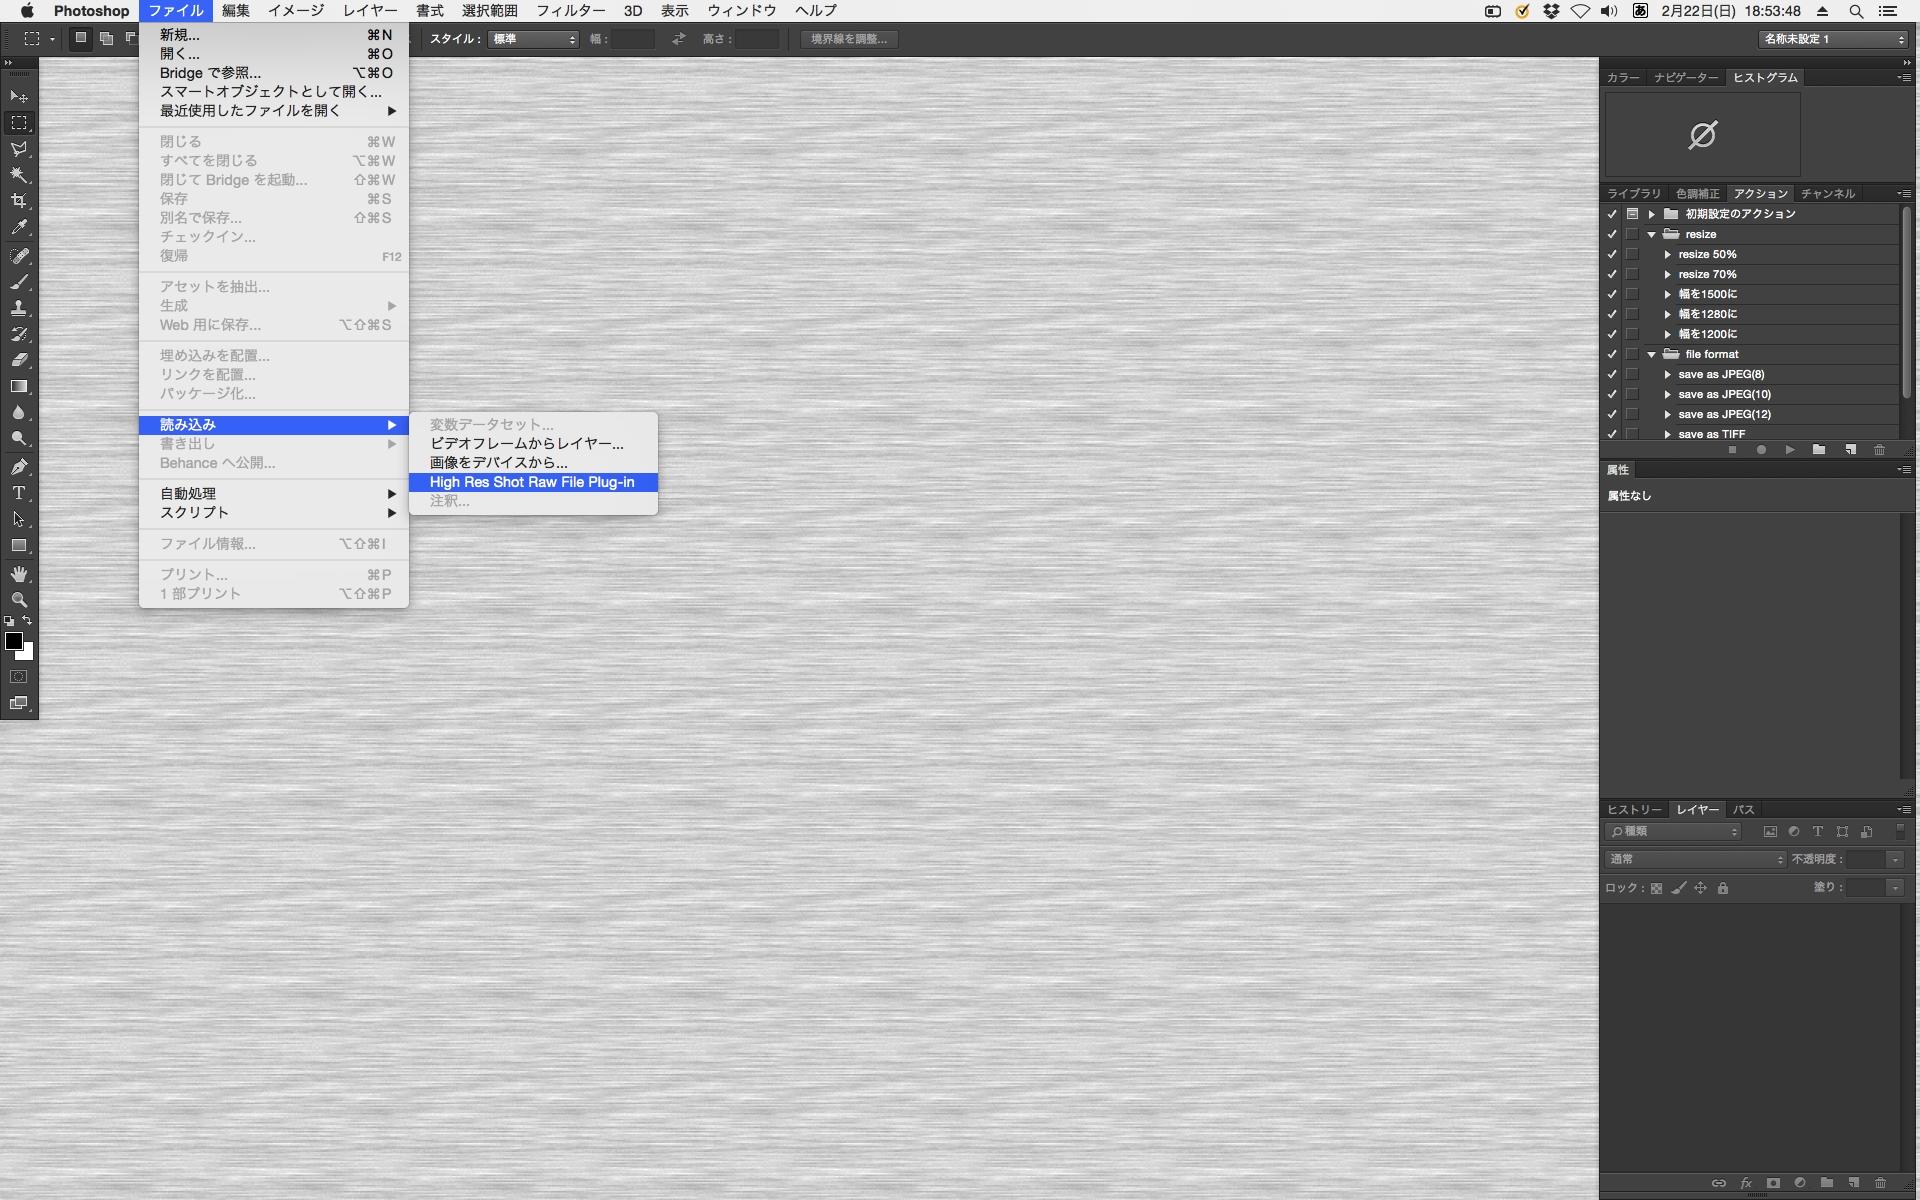 64M RAWを現像するには、Photoshopを使う。「ファイル」メニューから「読み込み」→「High Res Shot Raw File Plug-in」を選択する。